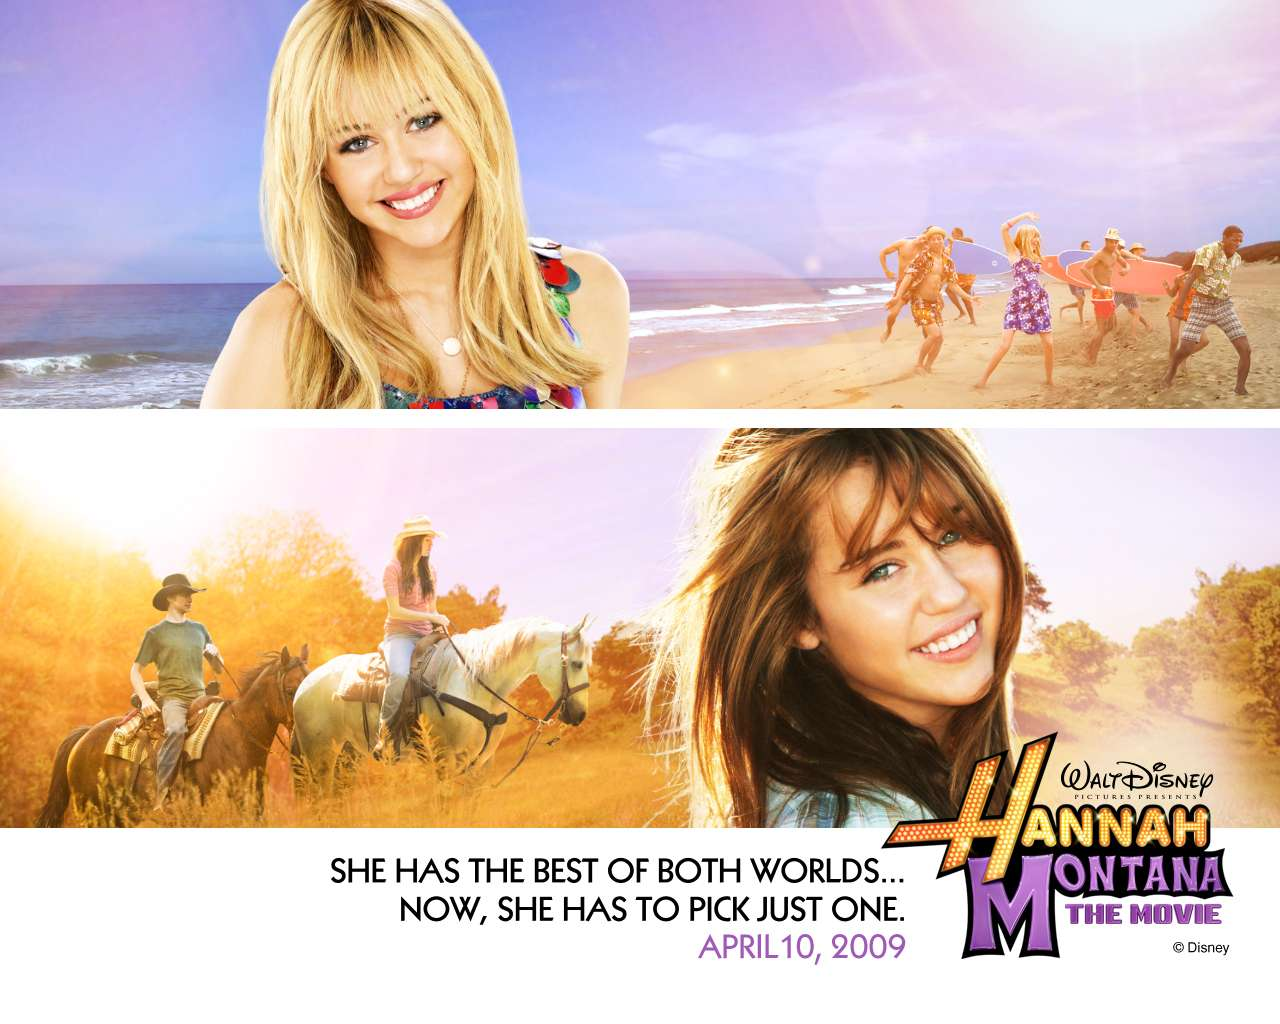 2009 hannah montana the movie wallpaper 001 Pop it, lock it, polka dot it